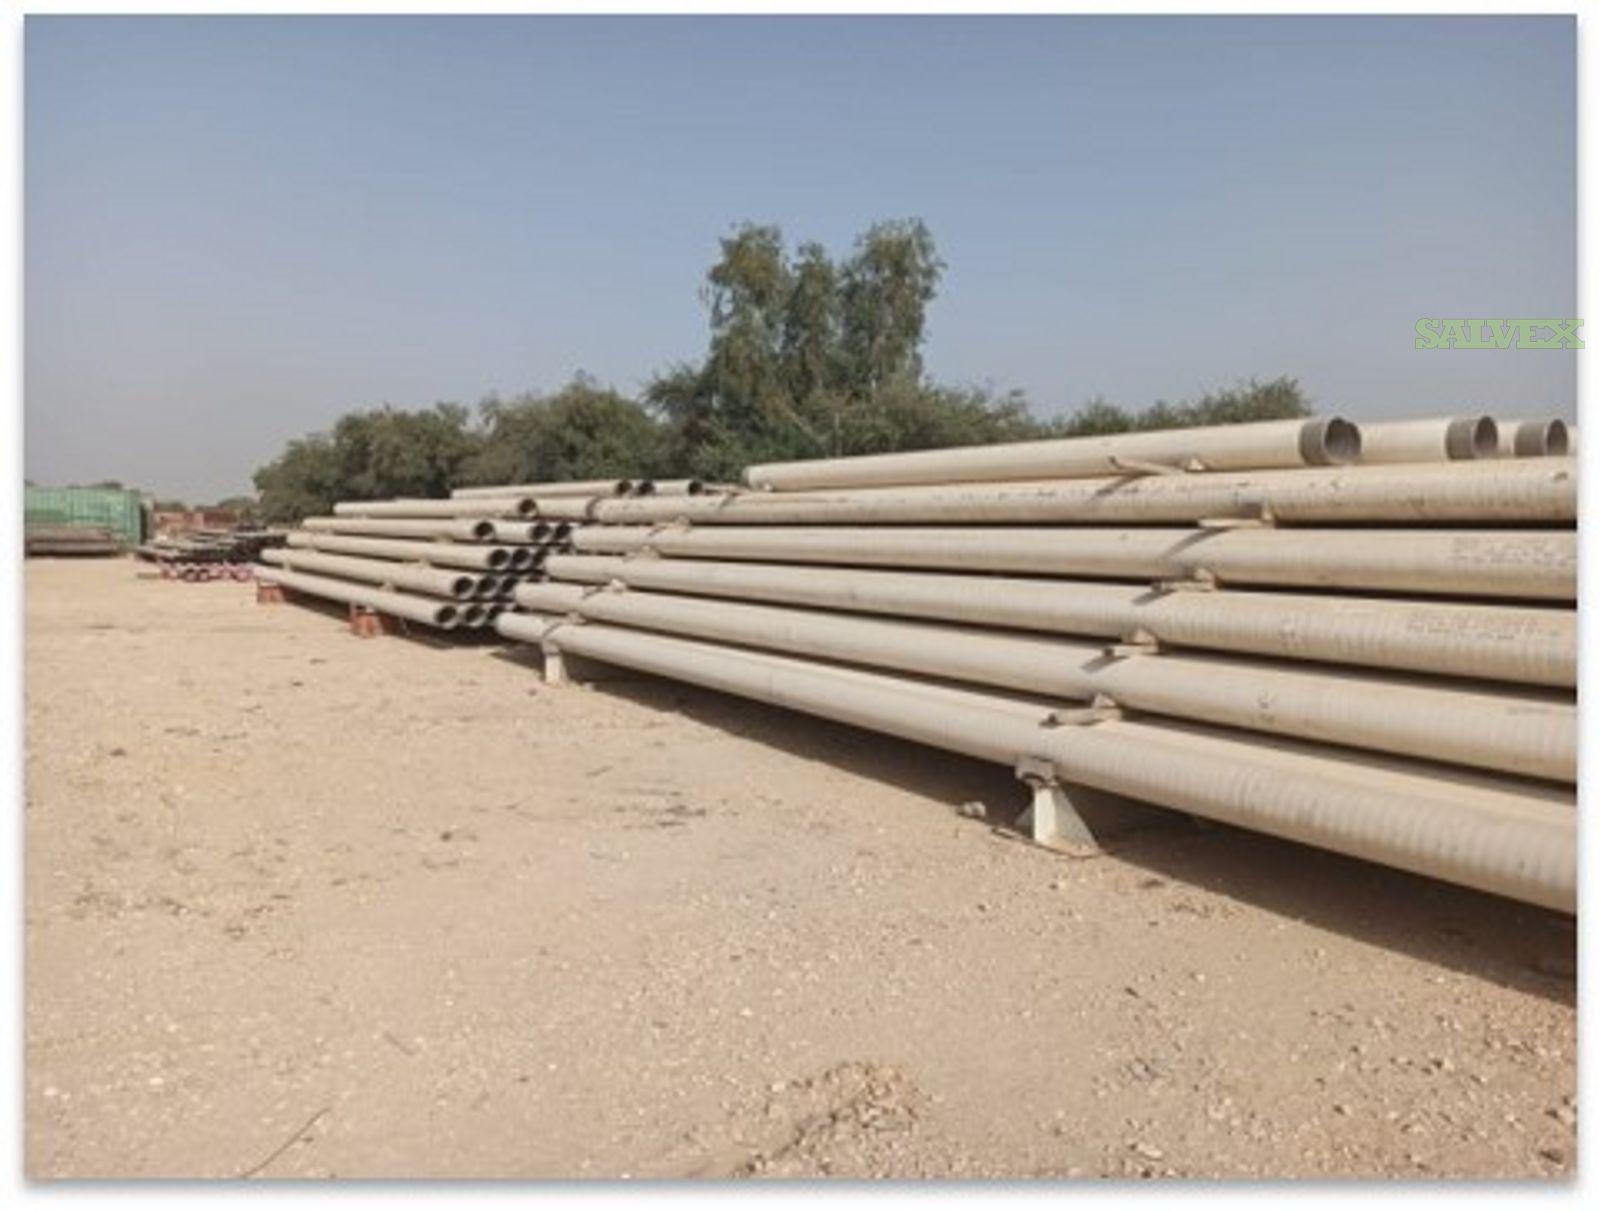 10 35.49# 22%CR Used Flow Line (24,928 Feet / 401 Metric Tons)